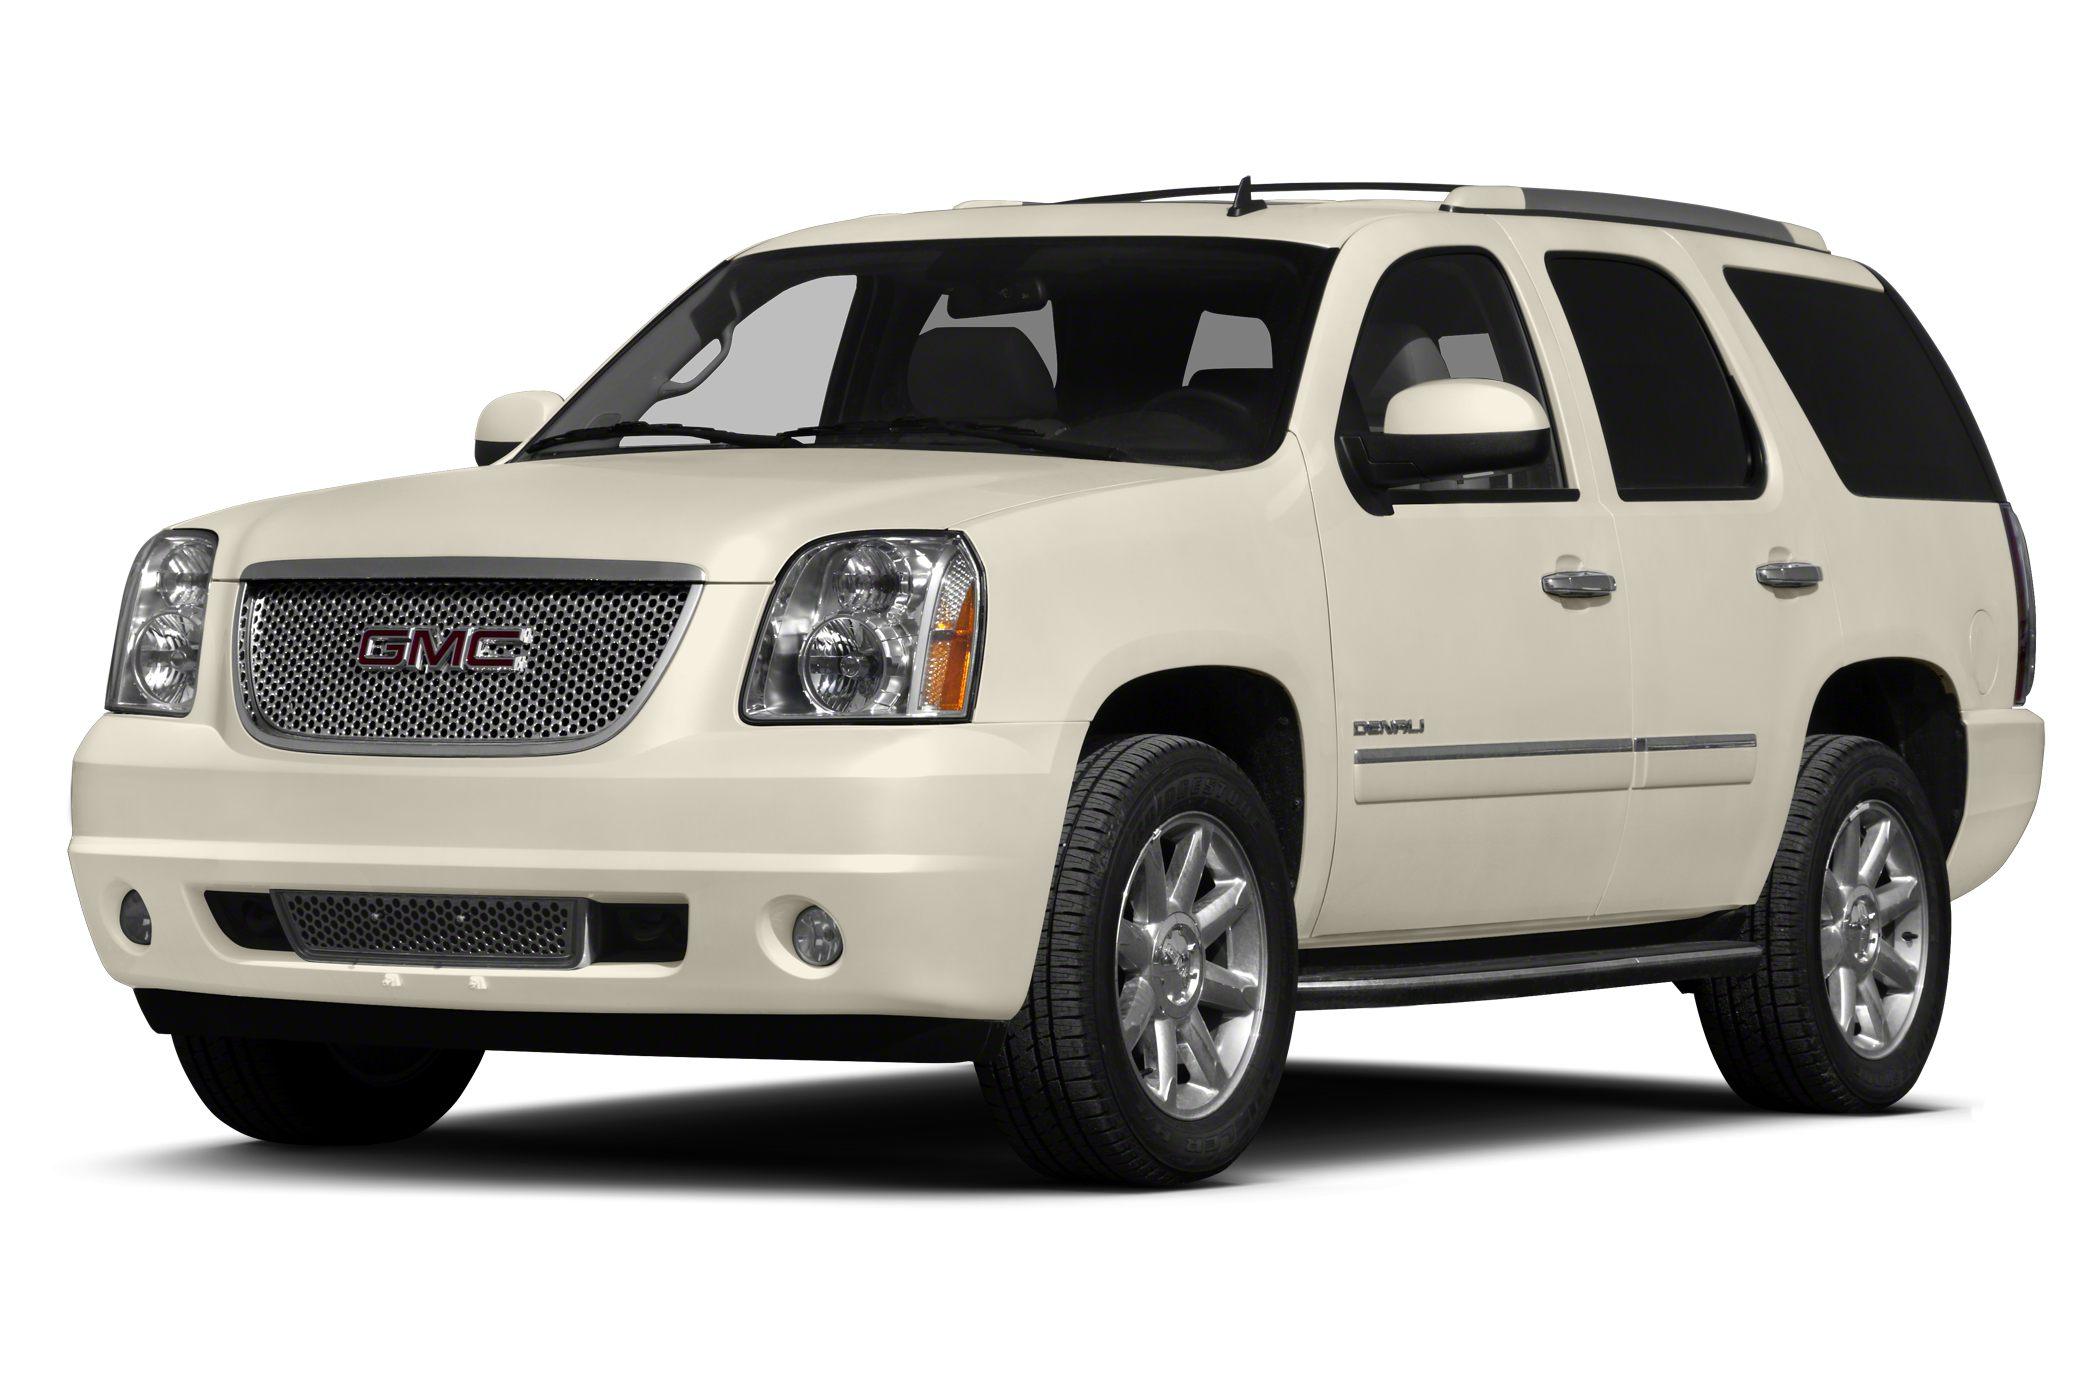 drive com crew images specs dp vehicles reviews cab amazon sierra and wheel gmc